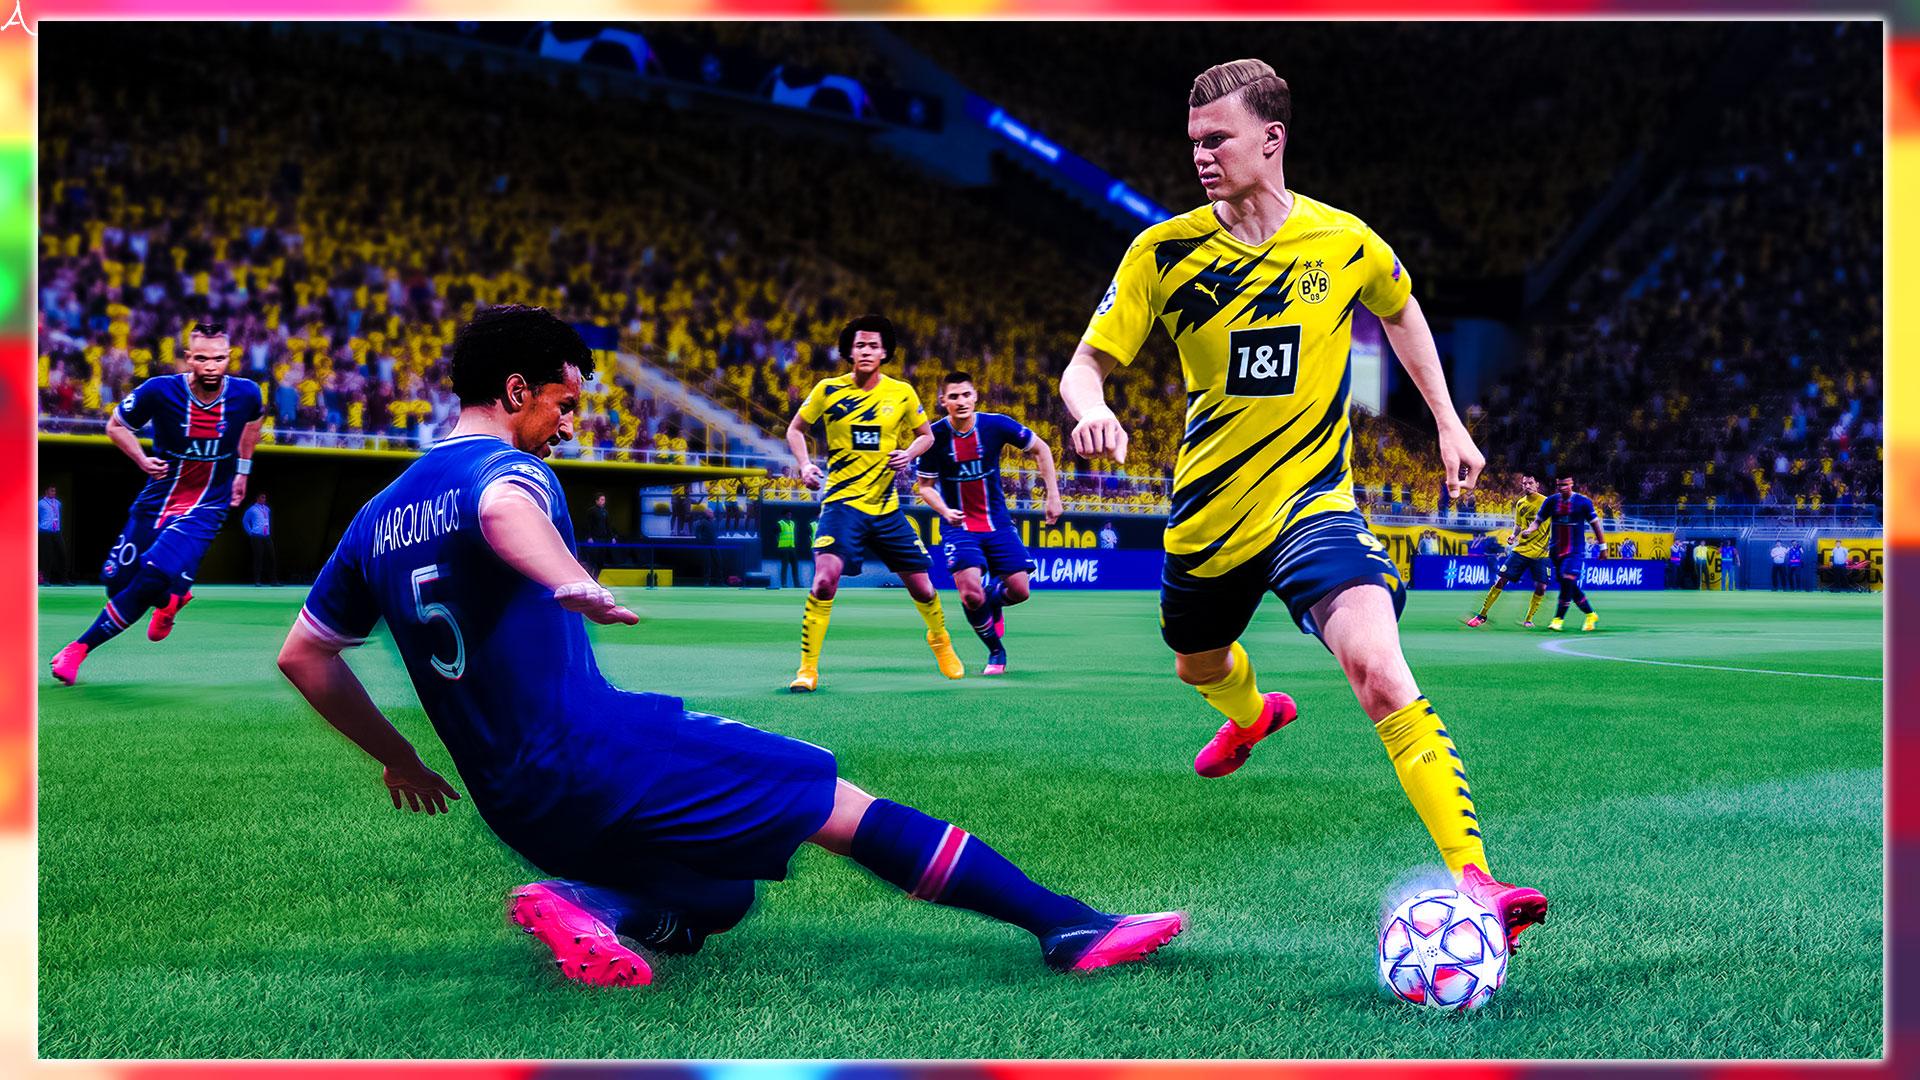 PC版「EA SPORTS FIFA 21」ゲームに必要な最低/推奨スペックを確認